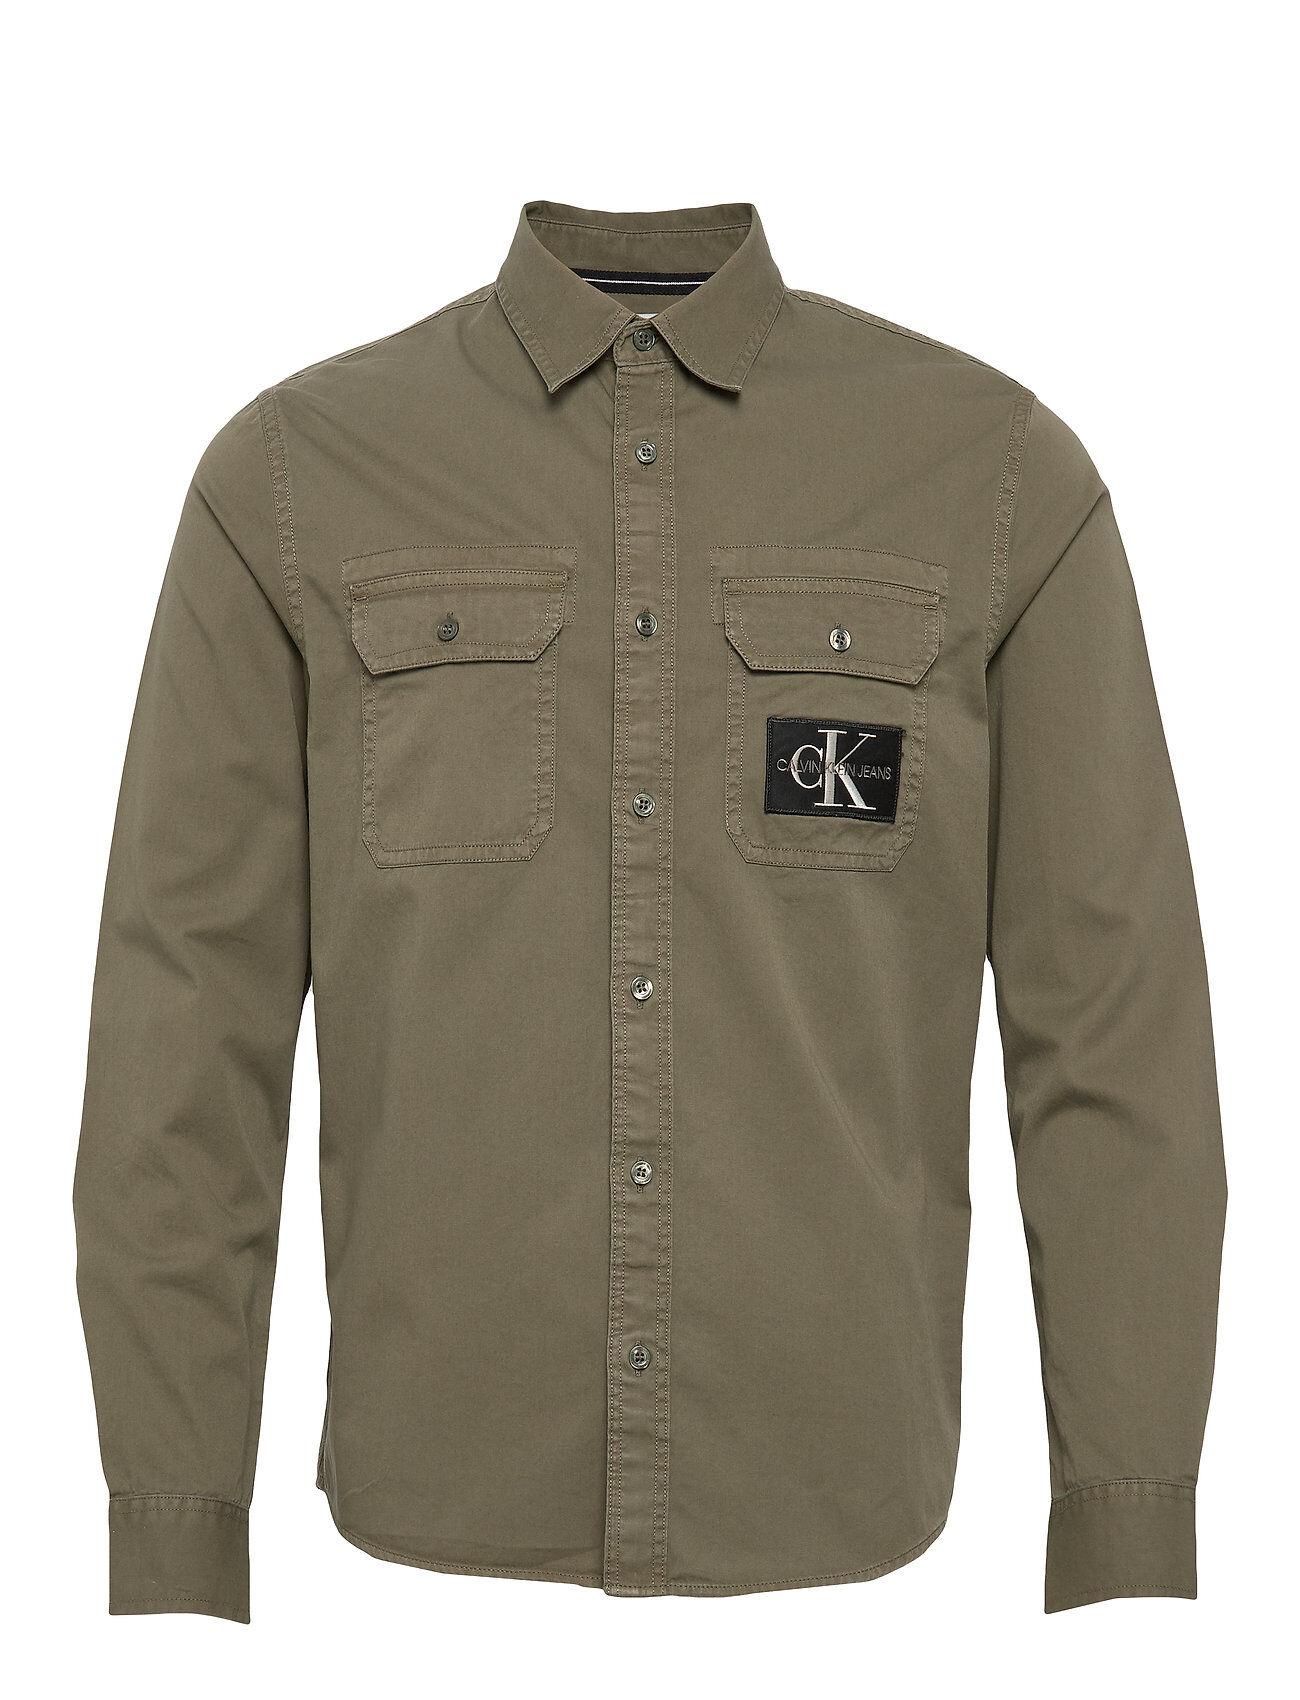 Image of Calvin Gmd Utility Reg Shirt Paita Rento Casual Vihreä Calvin Klein Jeans